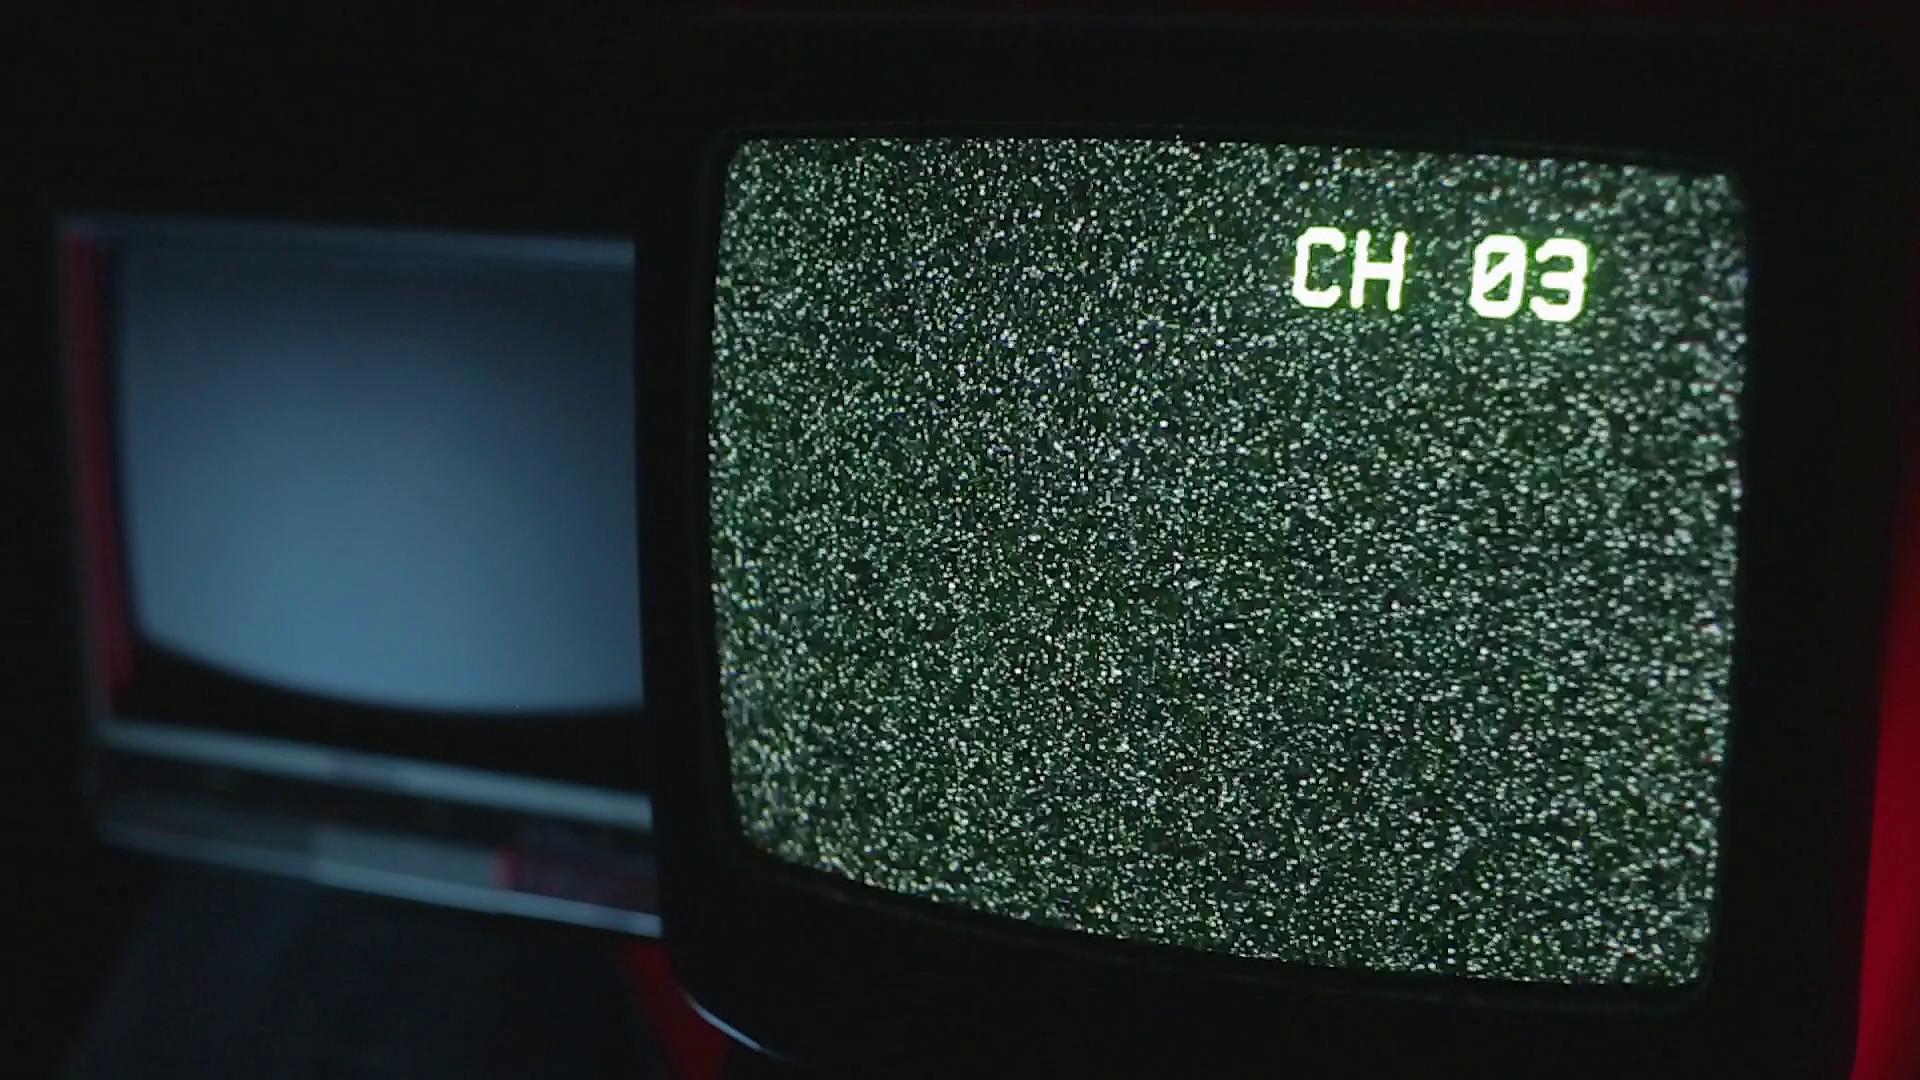 Retro TVs in a dark room | Static TV ON Stock Video Footage – VideoBlocks